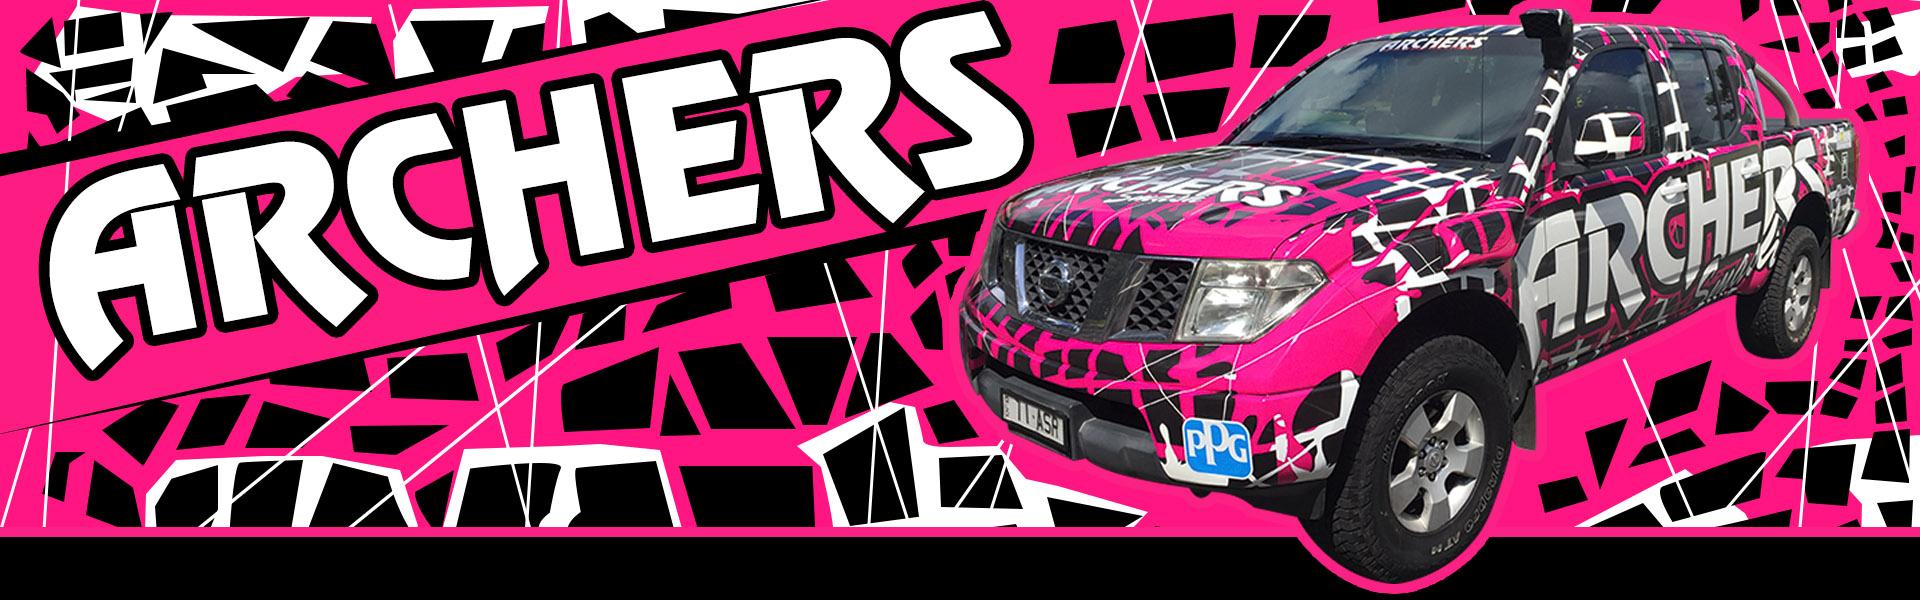 car-banner-design1